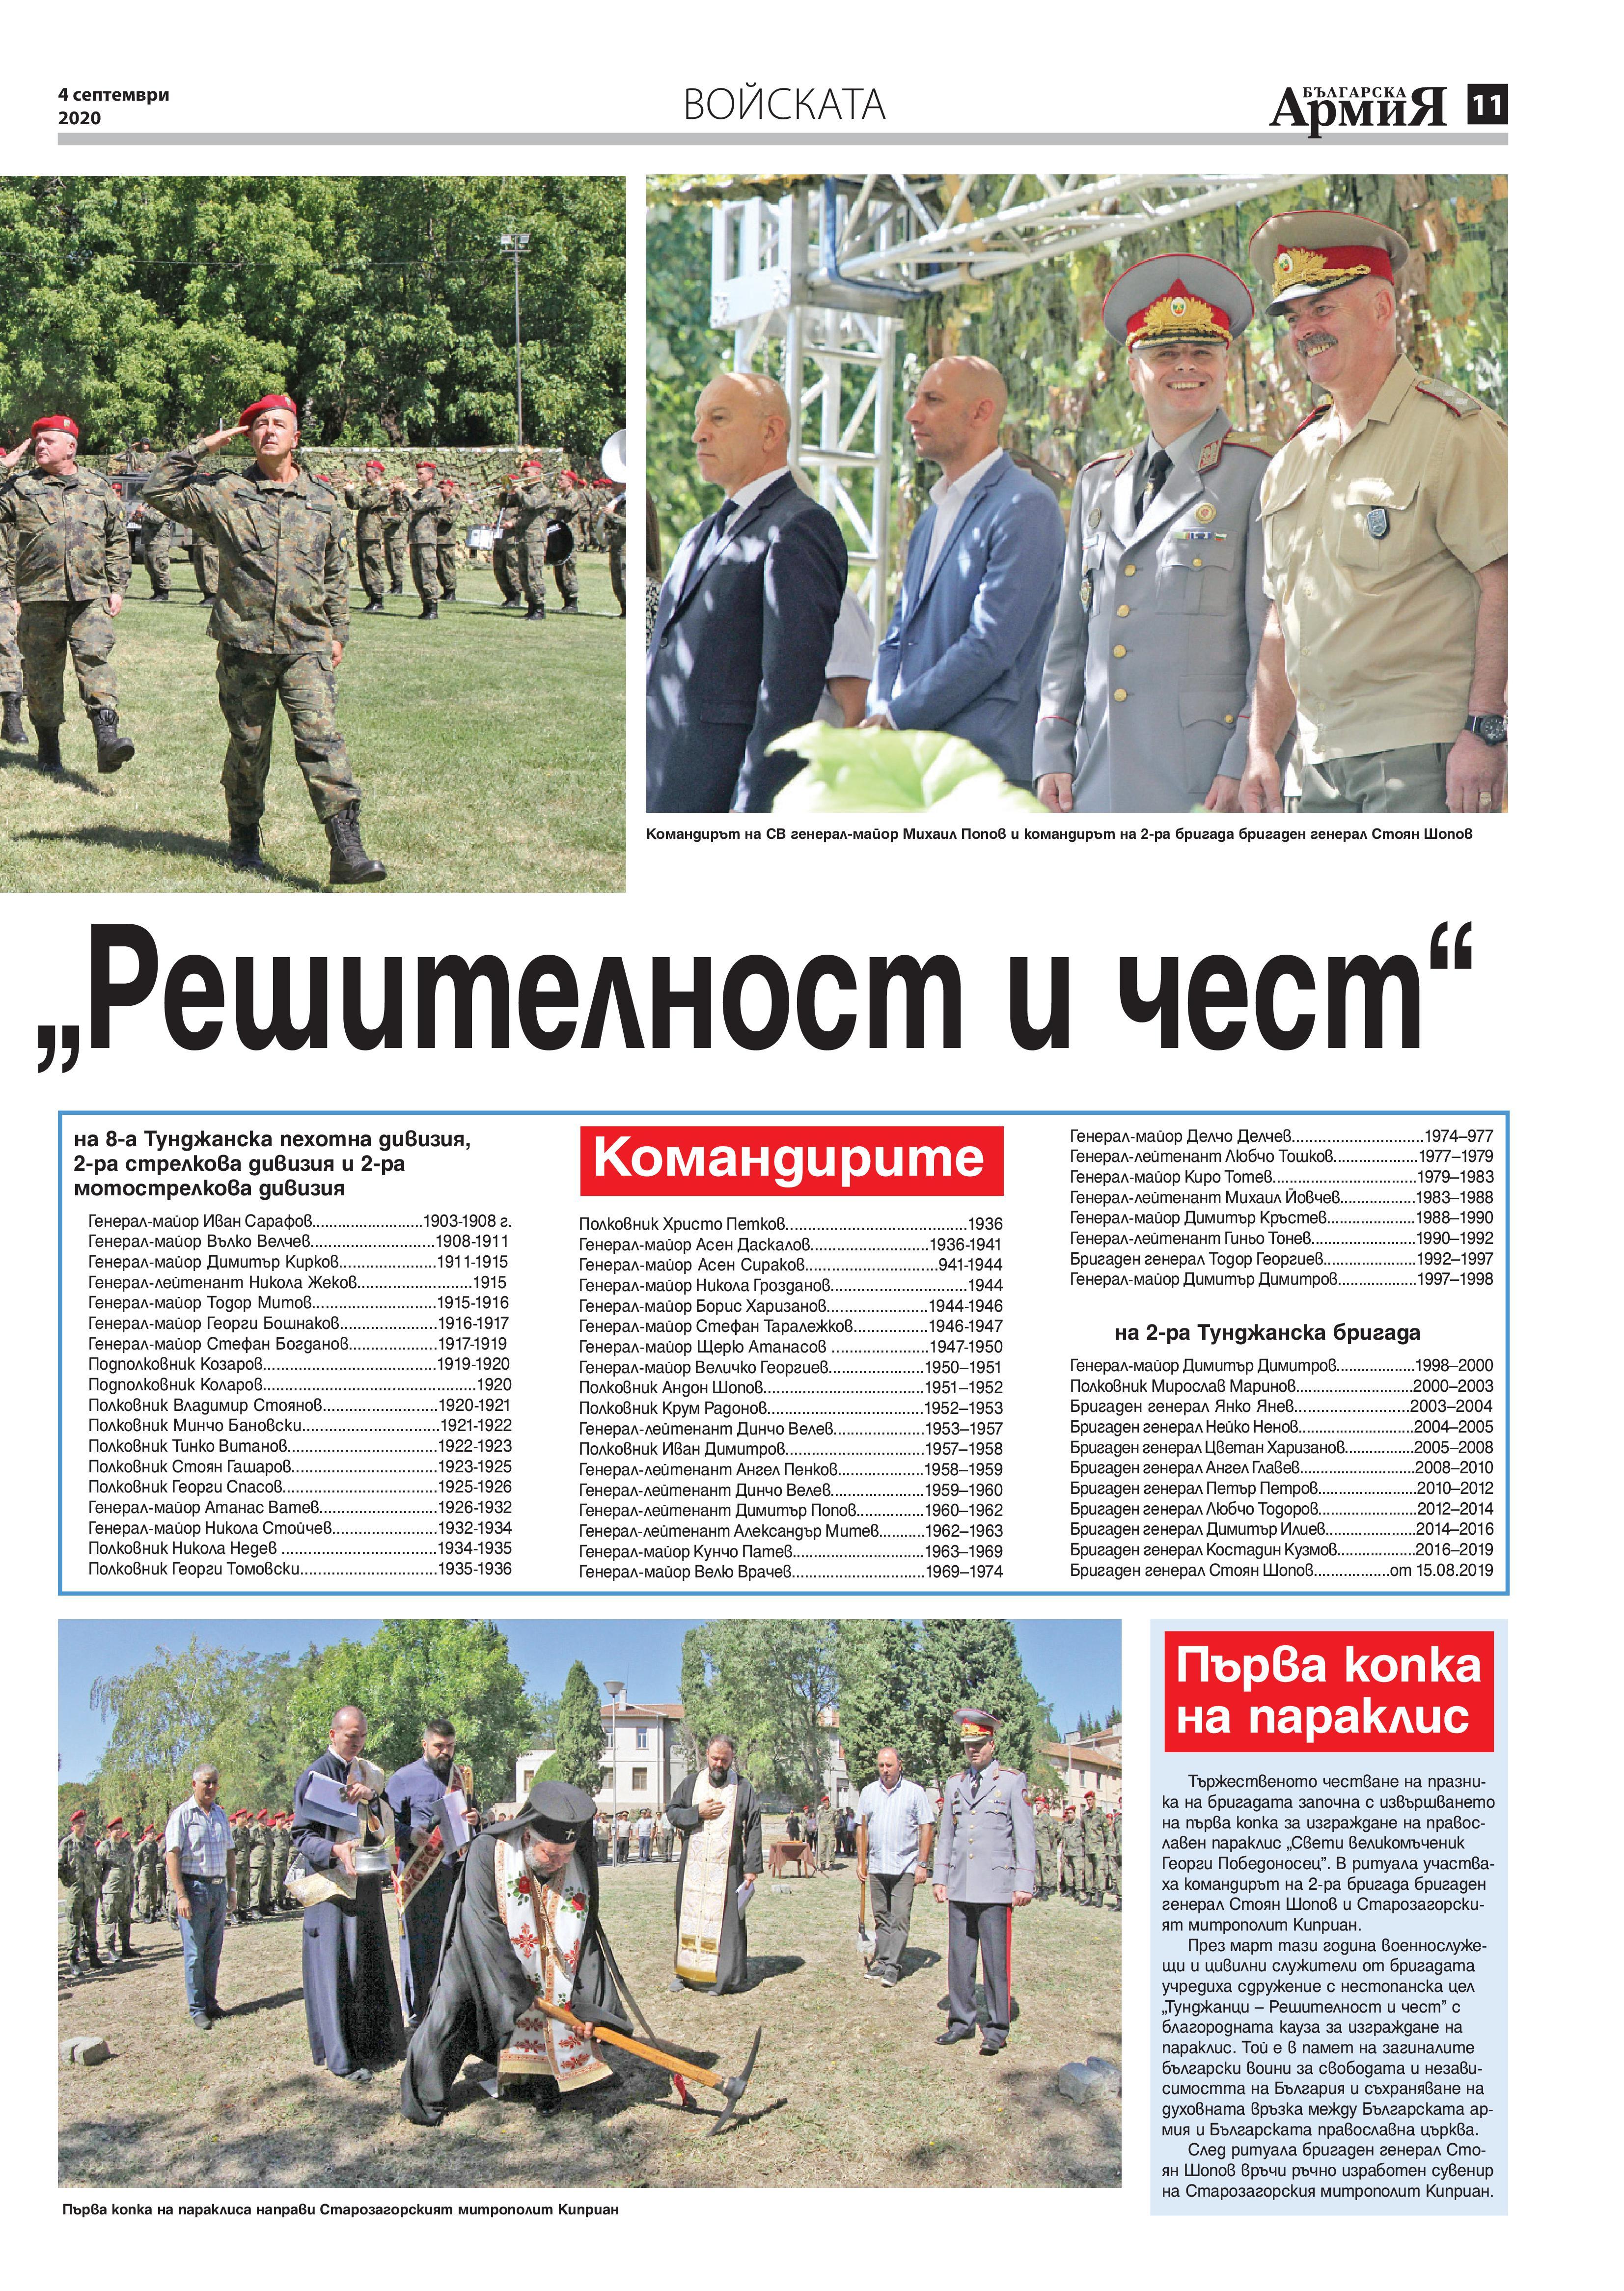 https://www.armymedia.bg/wp-content/uploads/2015/06/11-39.jpg